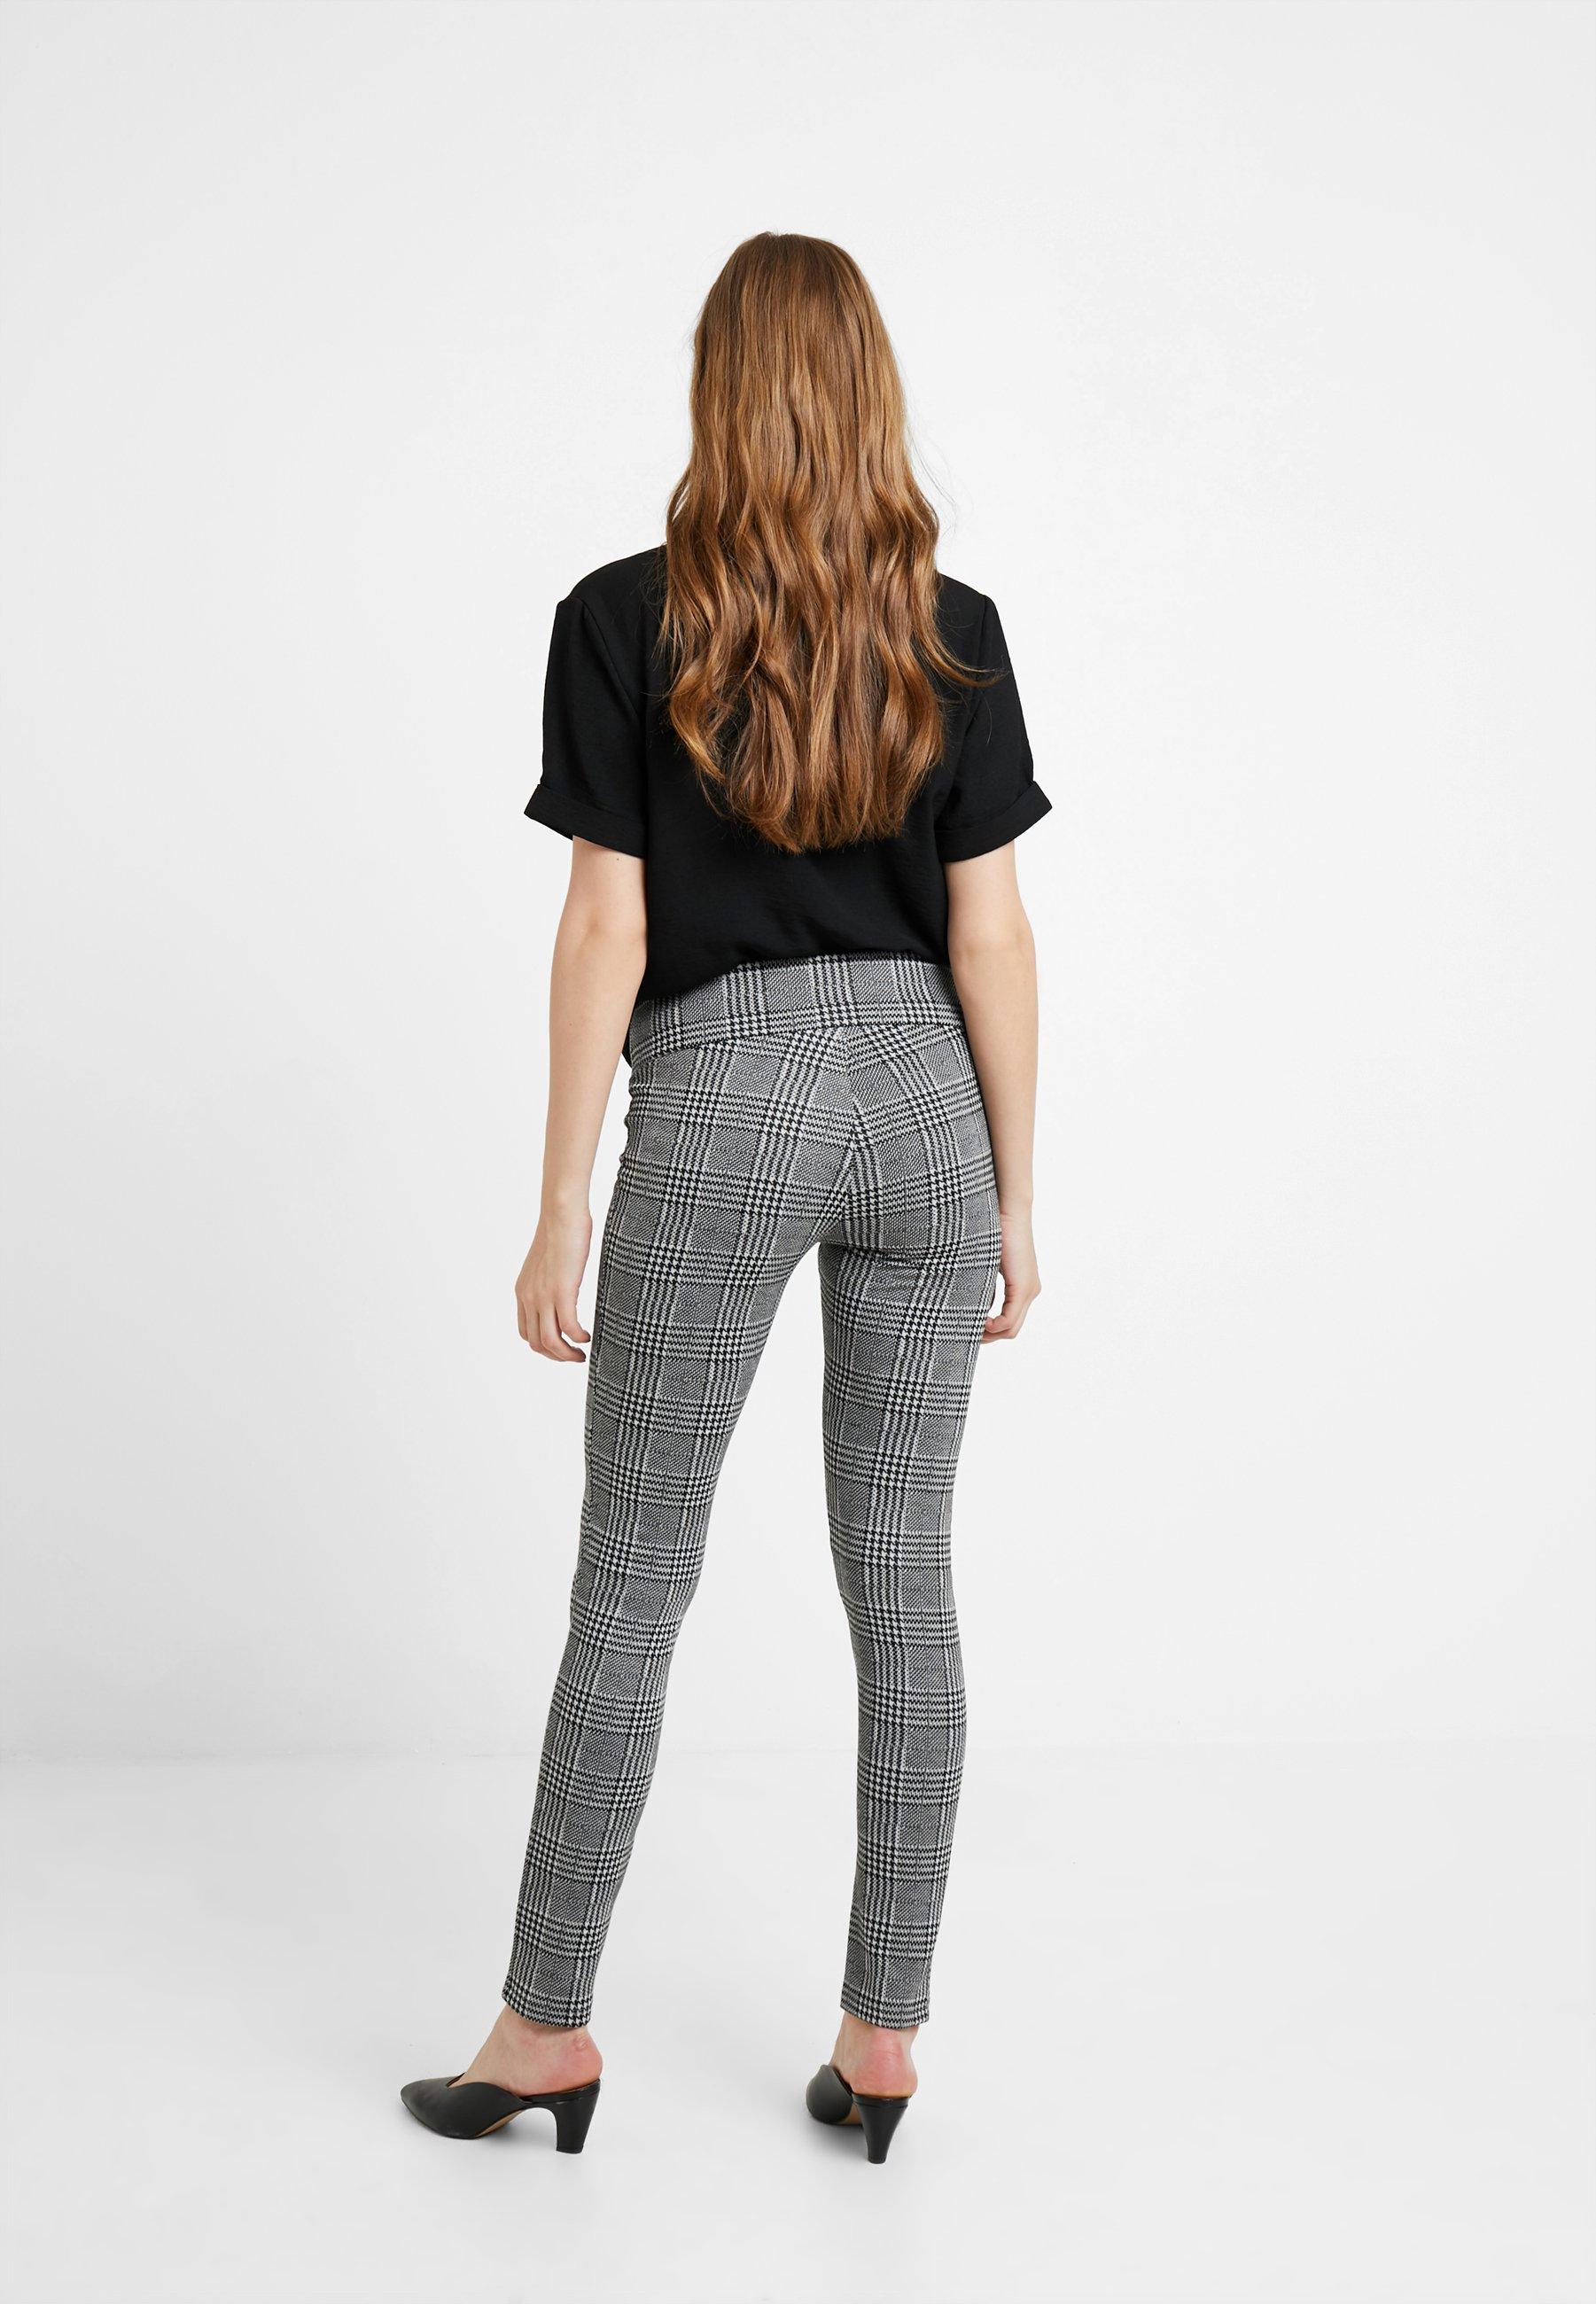 Maternity Black CheckPantalon Classique Pants Esprit mNn0Ov8w